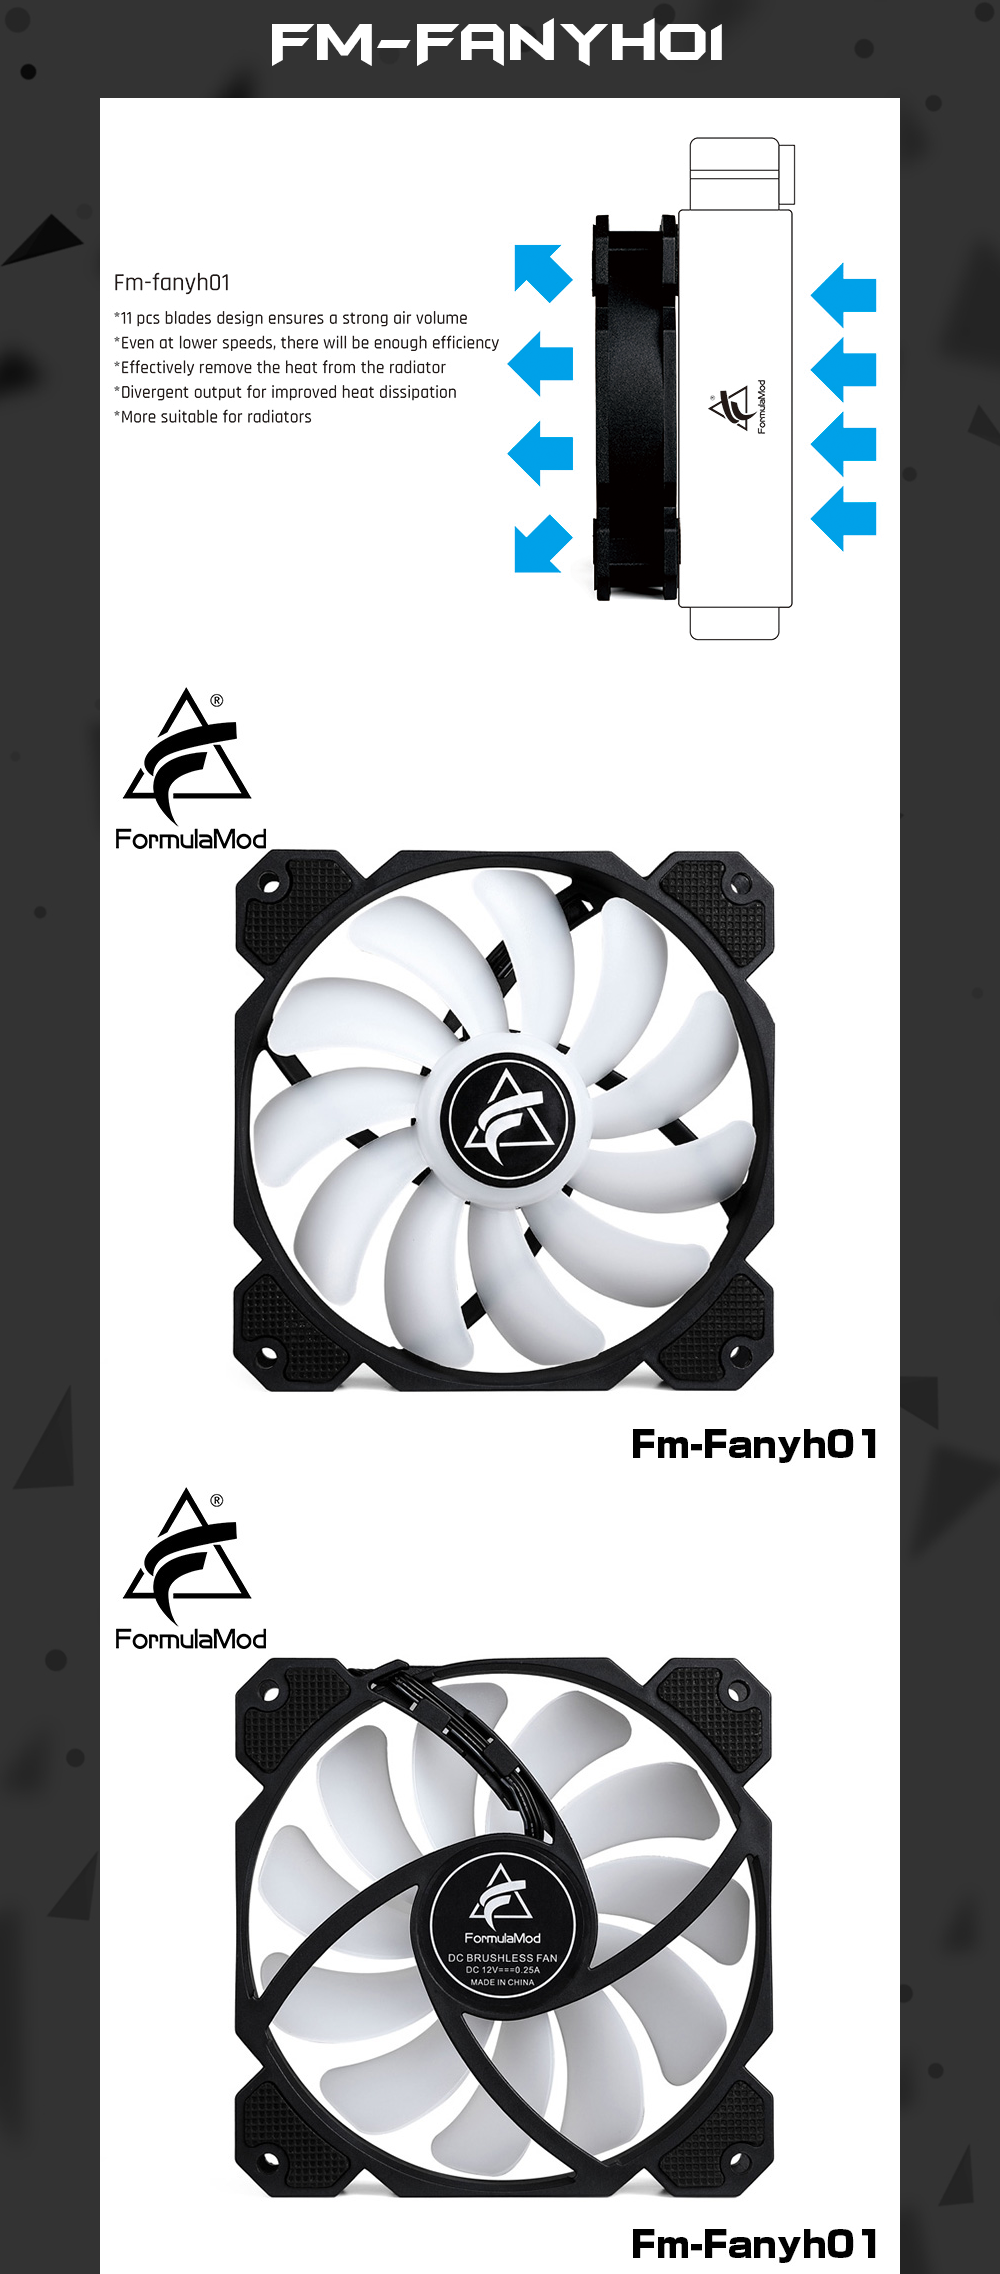 FormulaMod Fm-Fanyh 120mm PWM Fan 5v 3Pin RGB Multipurpose Radiator Cooler Case Fan Hydraulic Bearing 11/9 Large-size Blades